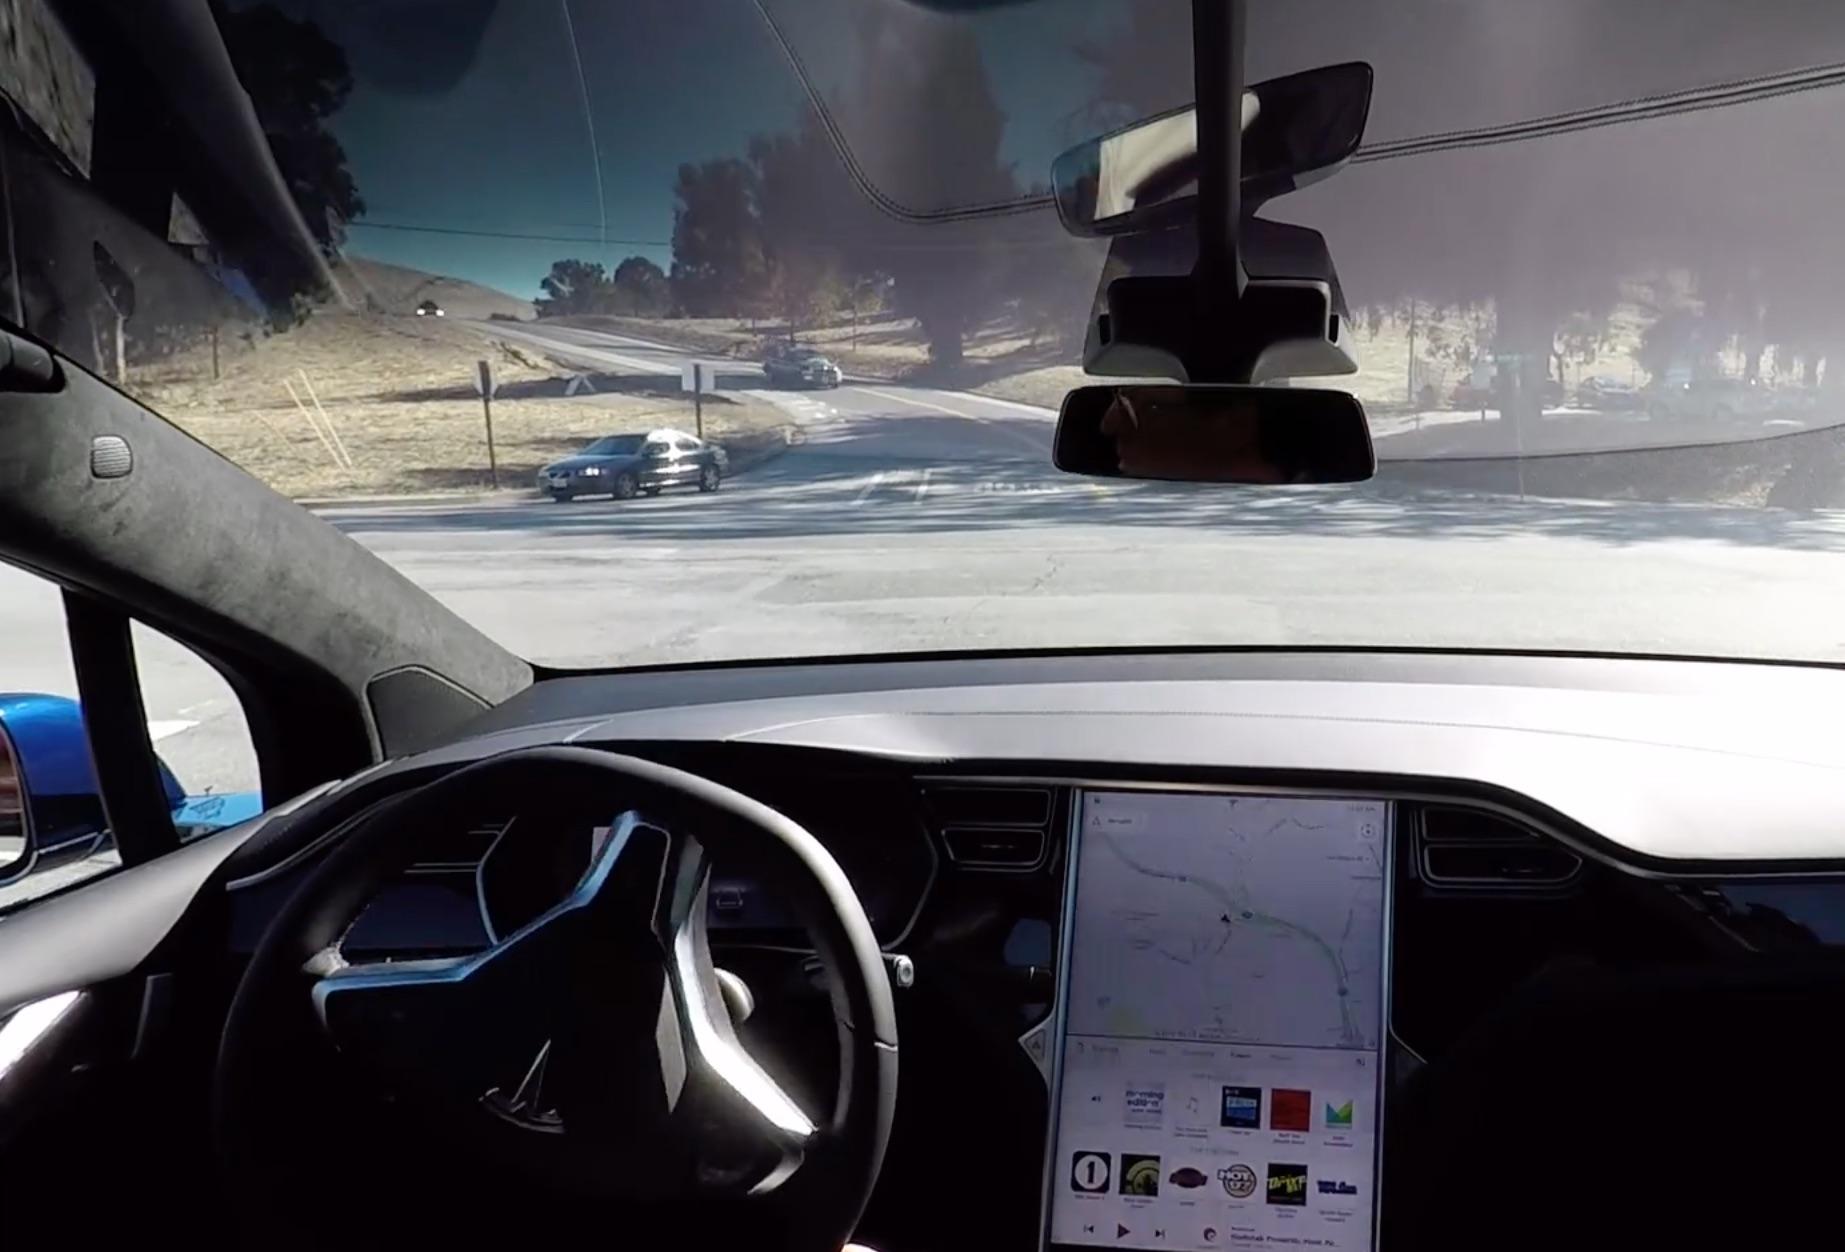 tesla-model-x-self-driving-intersection